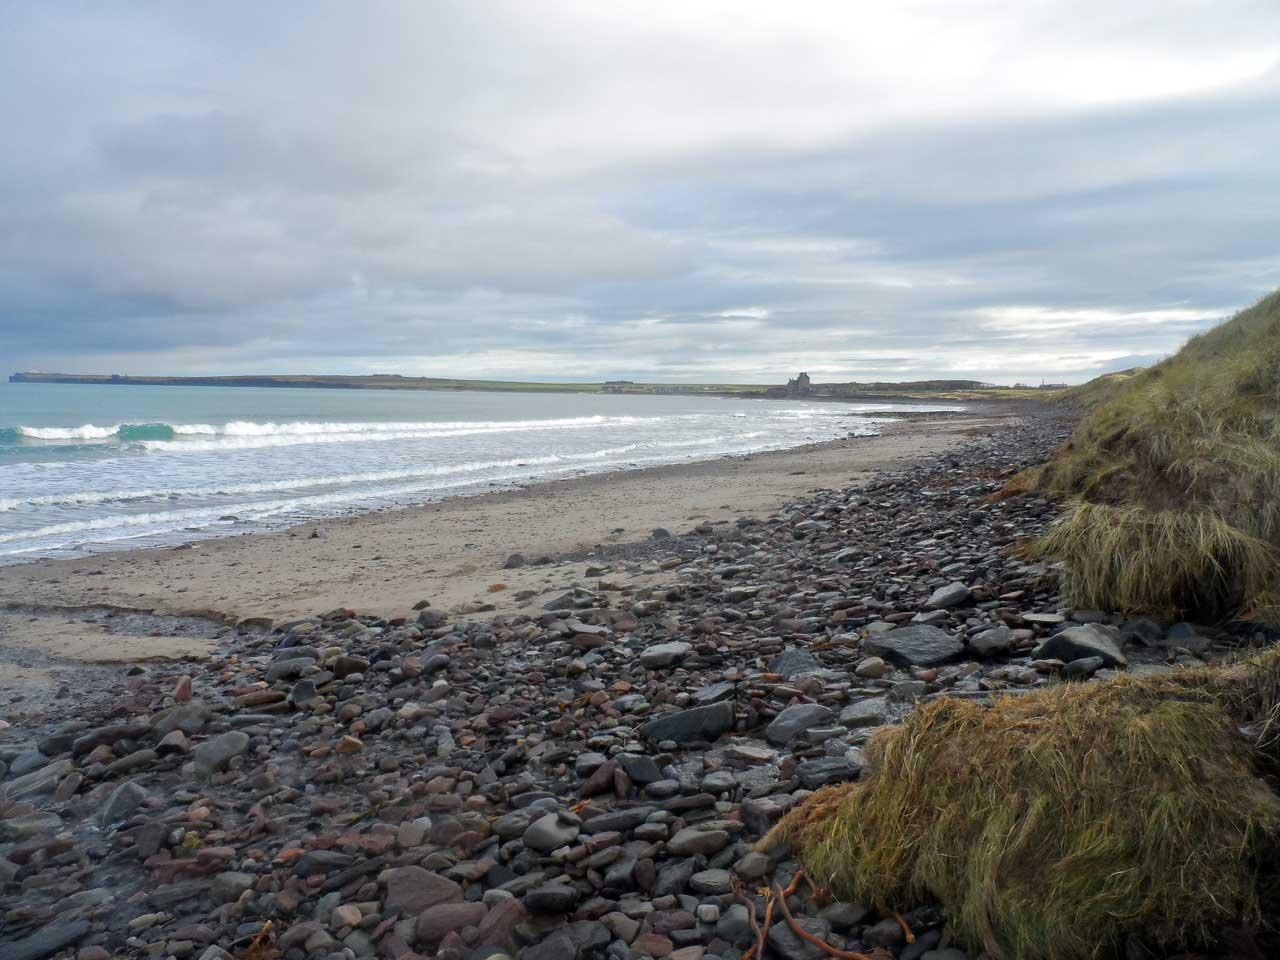 Photo: Reiss Beach, Caithness